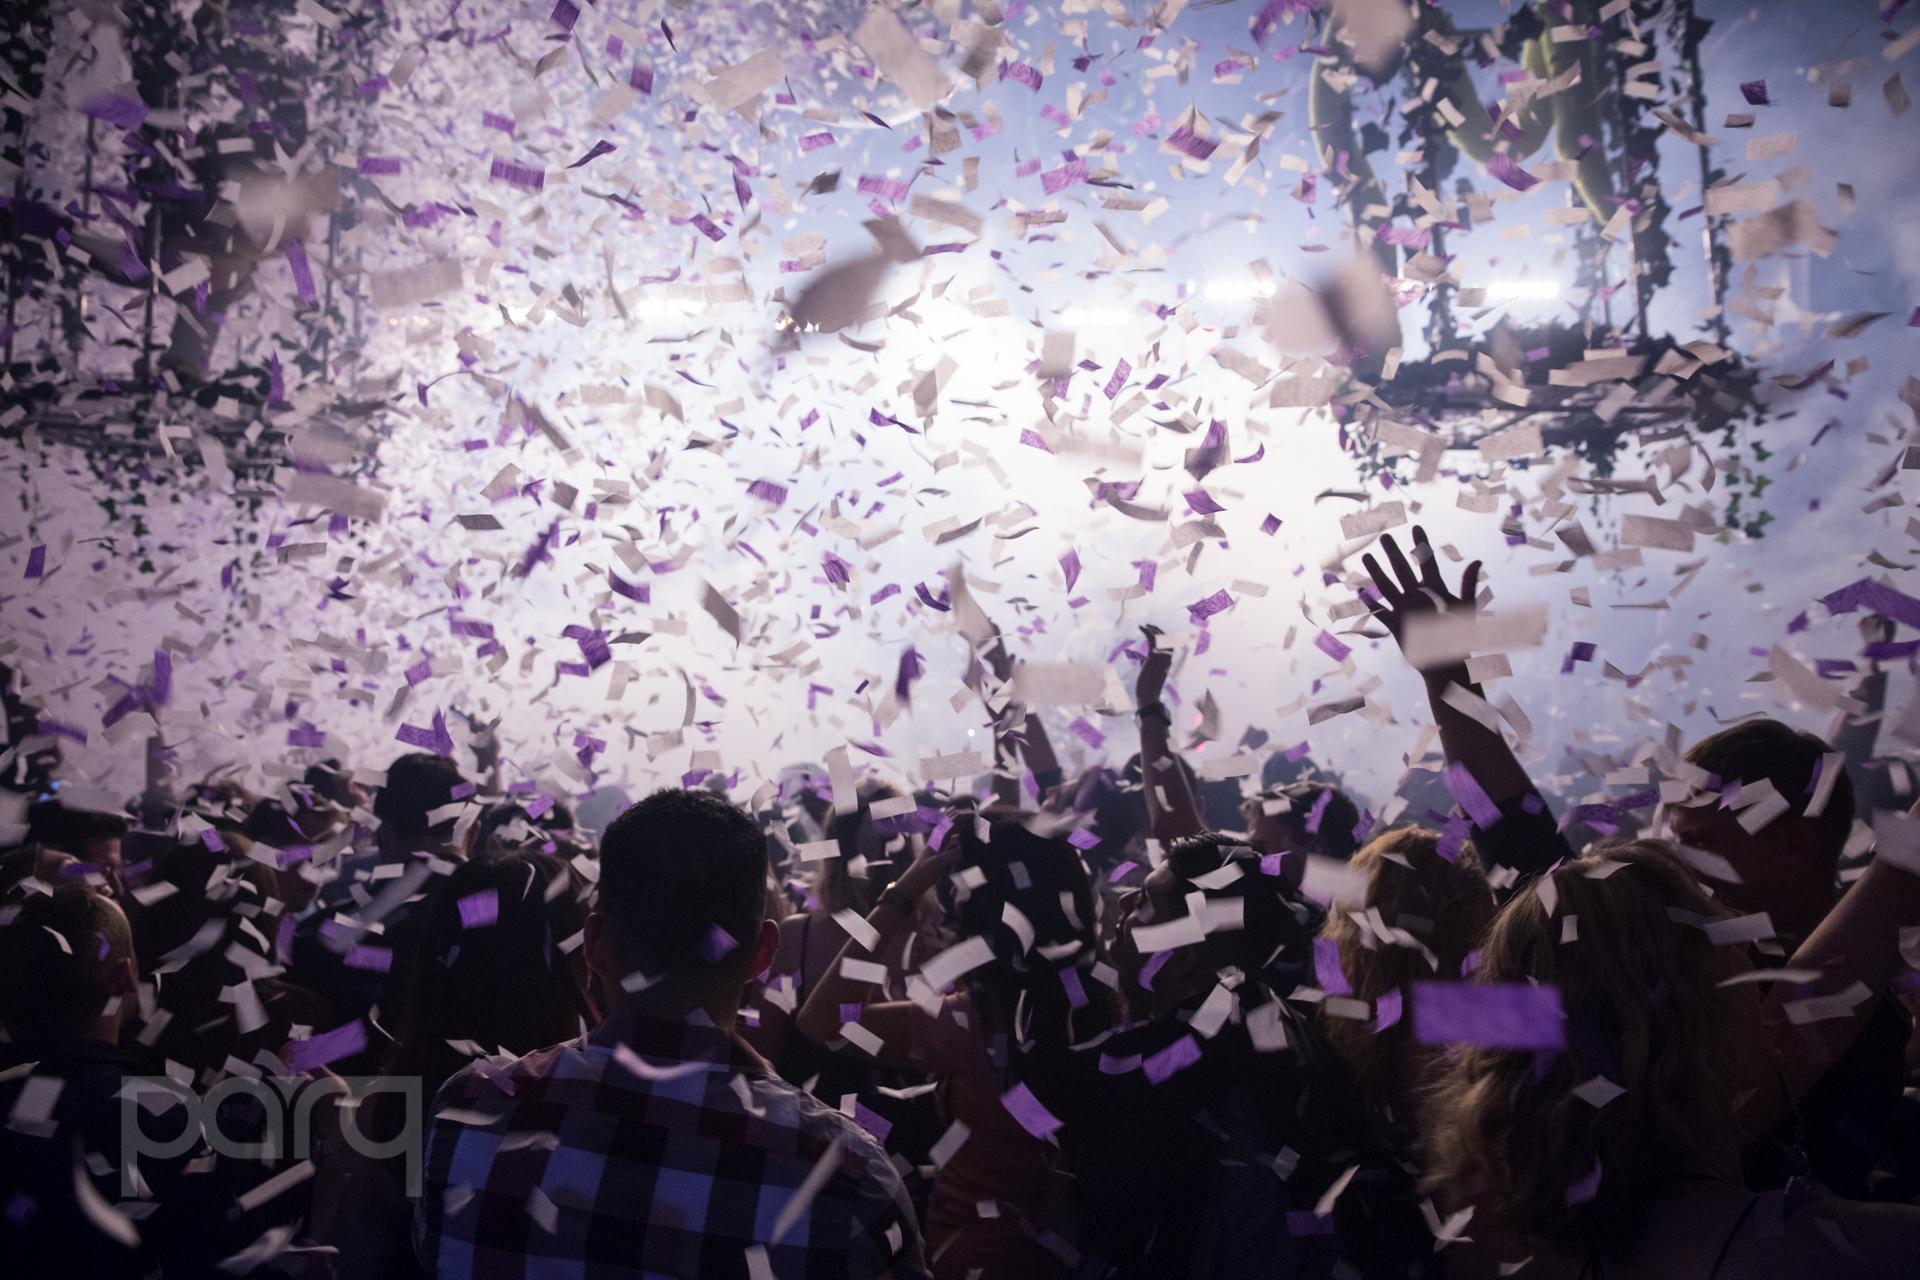 San-Diego-Nightclub-Zoo Funktion-30.jpg